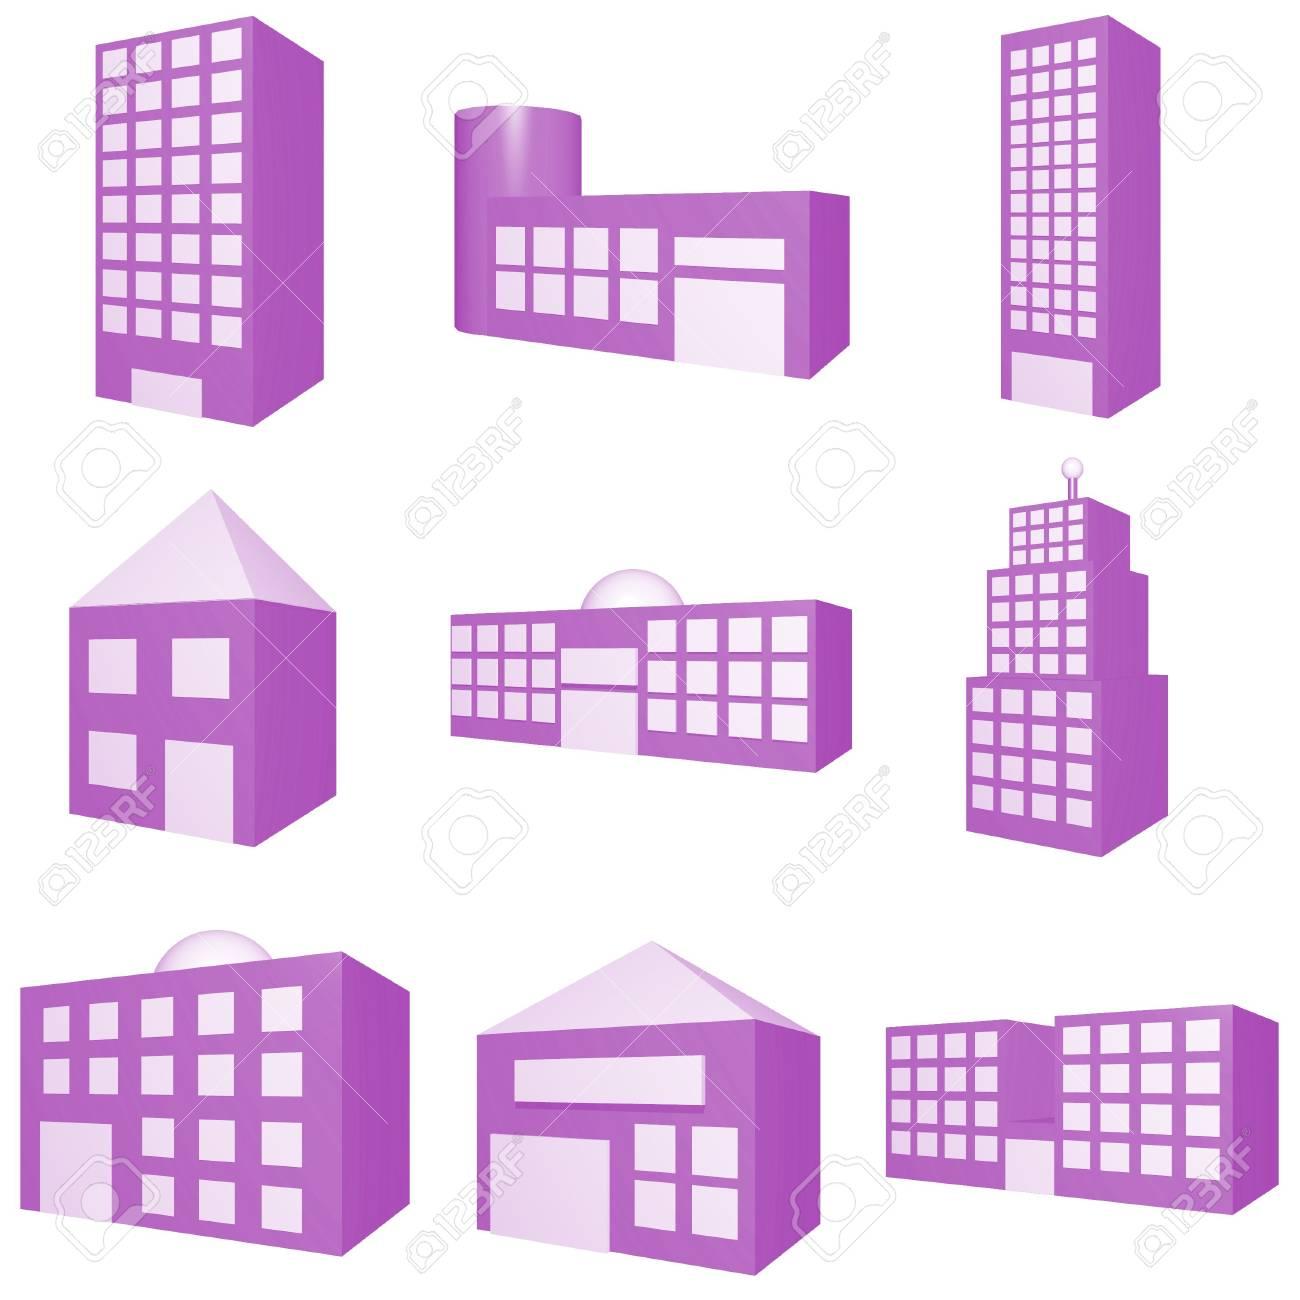 Building Icon Set in Purple Stock Photo - 3617624